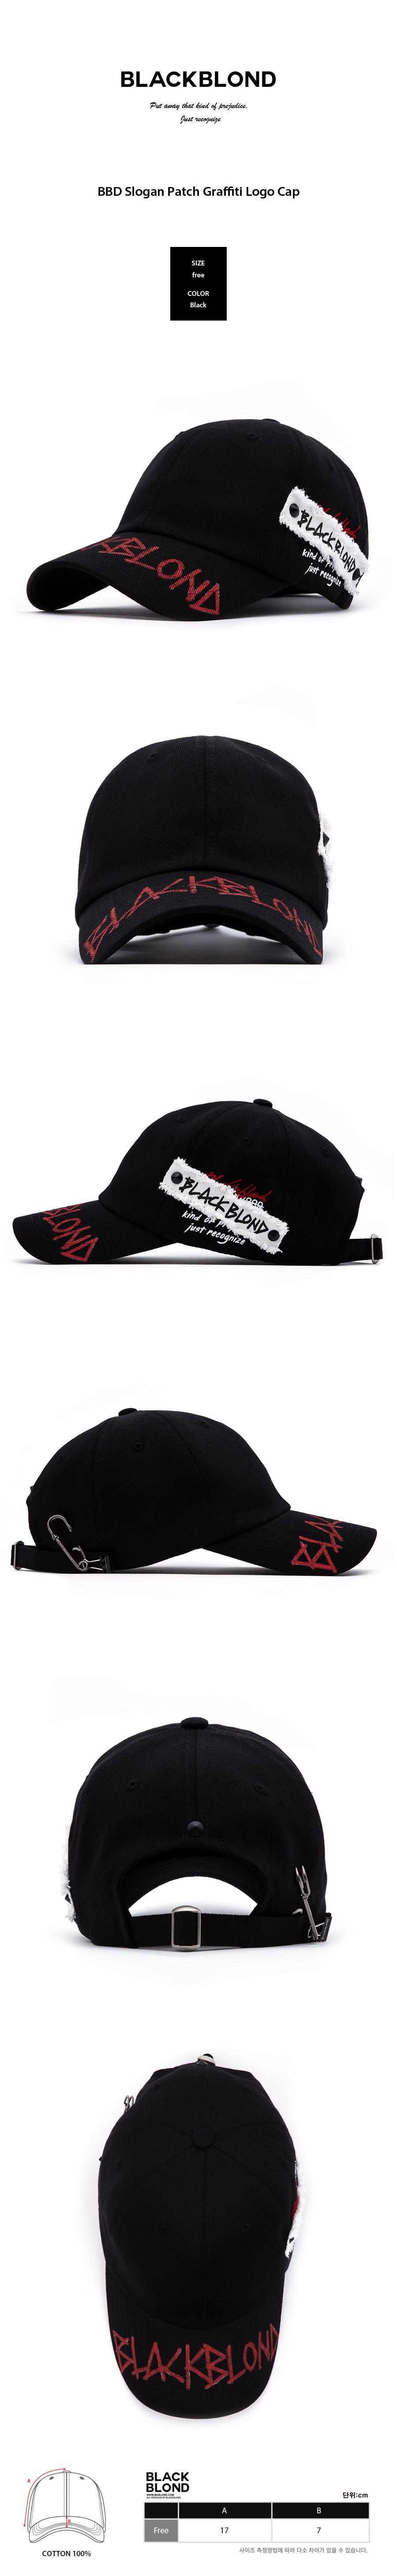 BBD-Slogan-Patch-Graffiti-Logo-Cap-%28Black%29.jpg